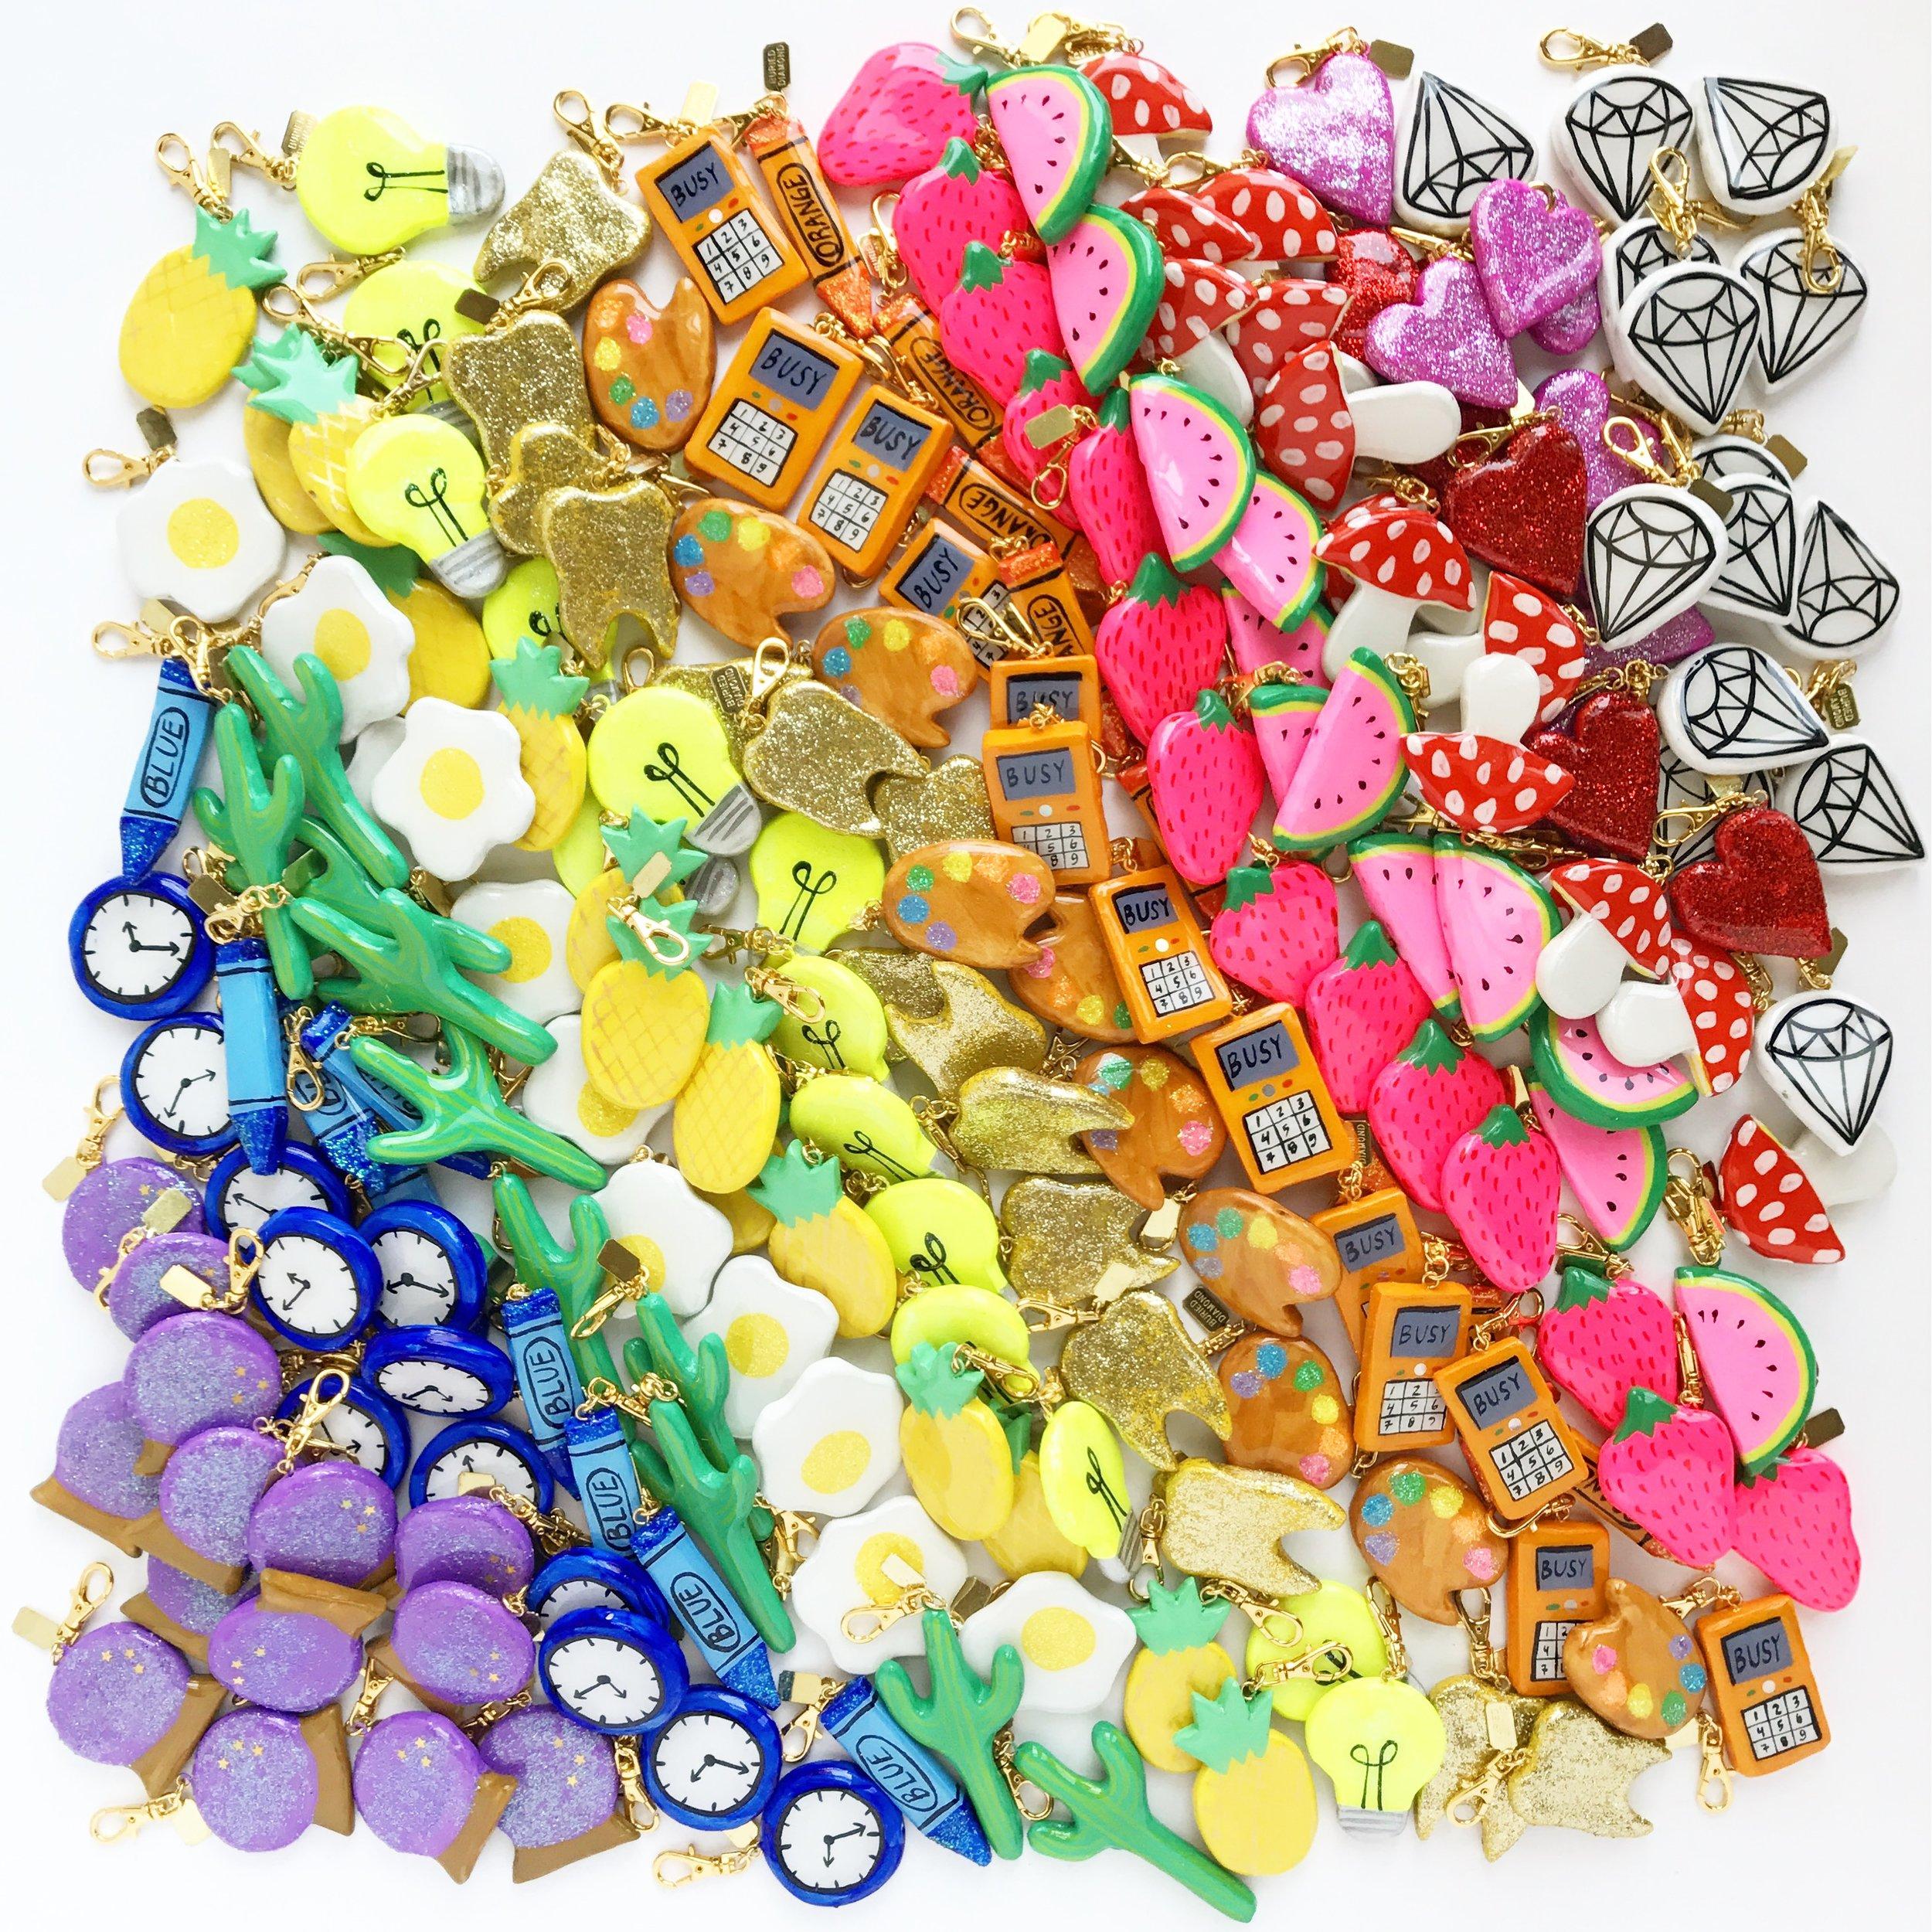 A huge pile of hand made chunky charms, awaiting a big charm sale!